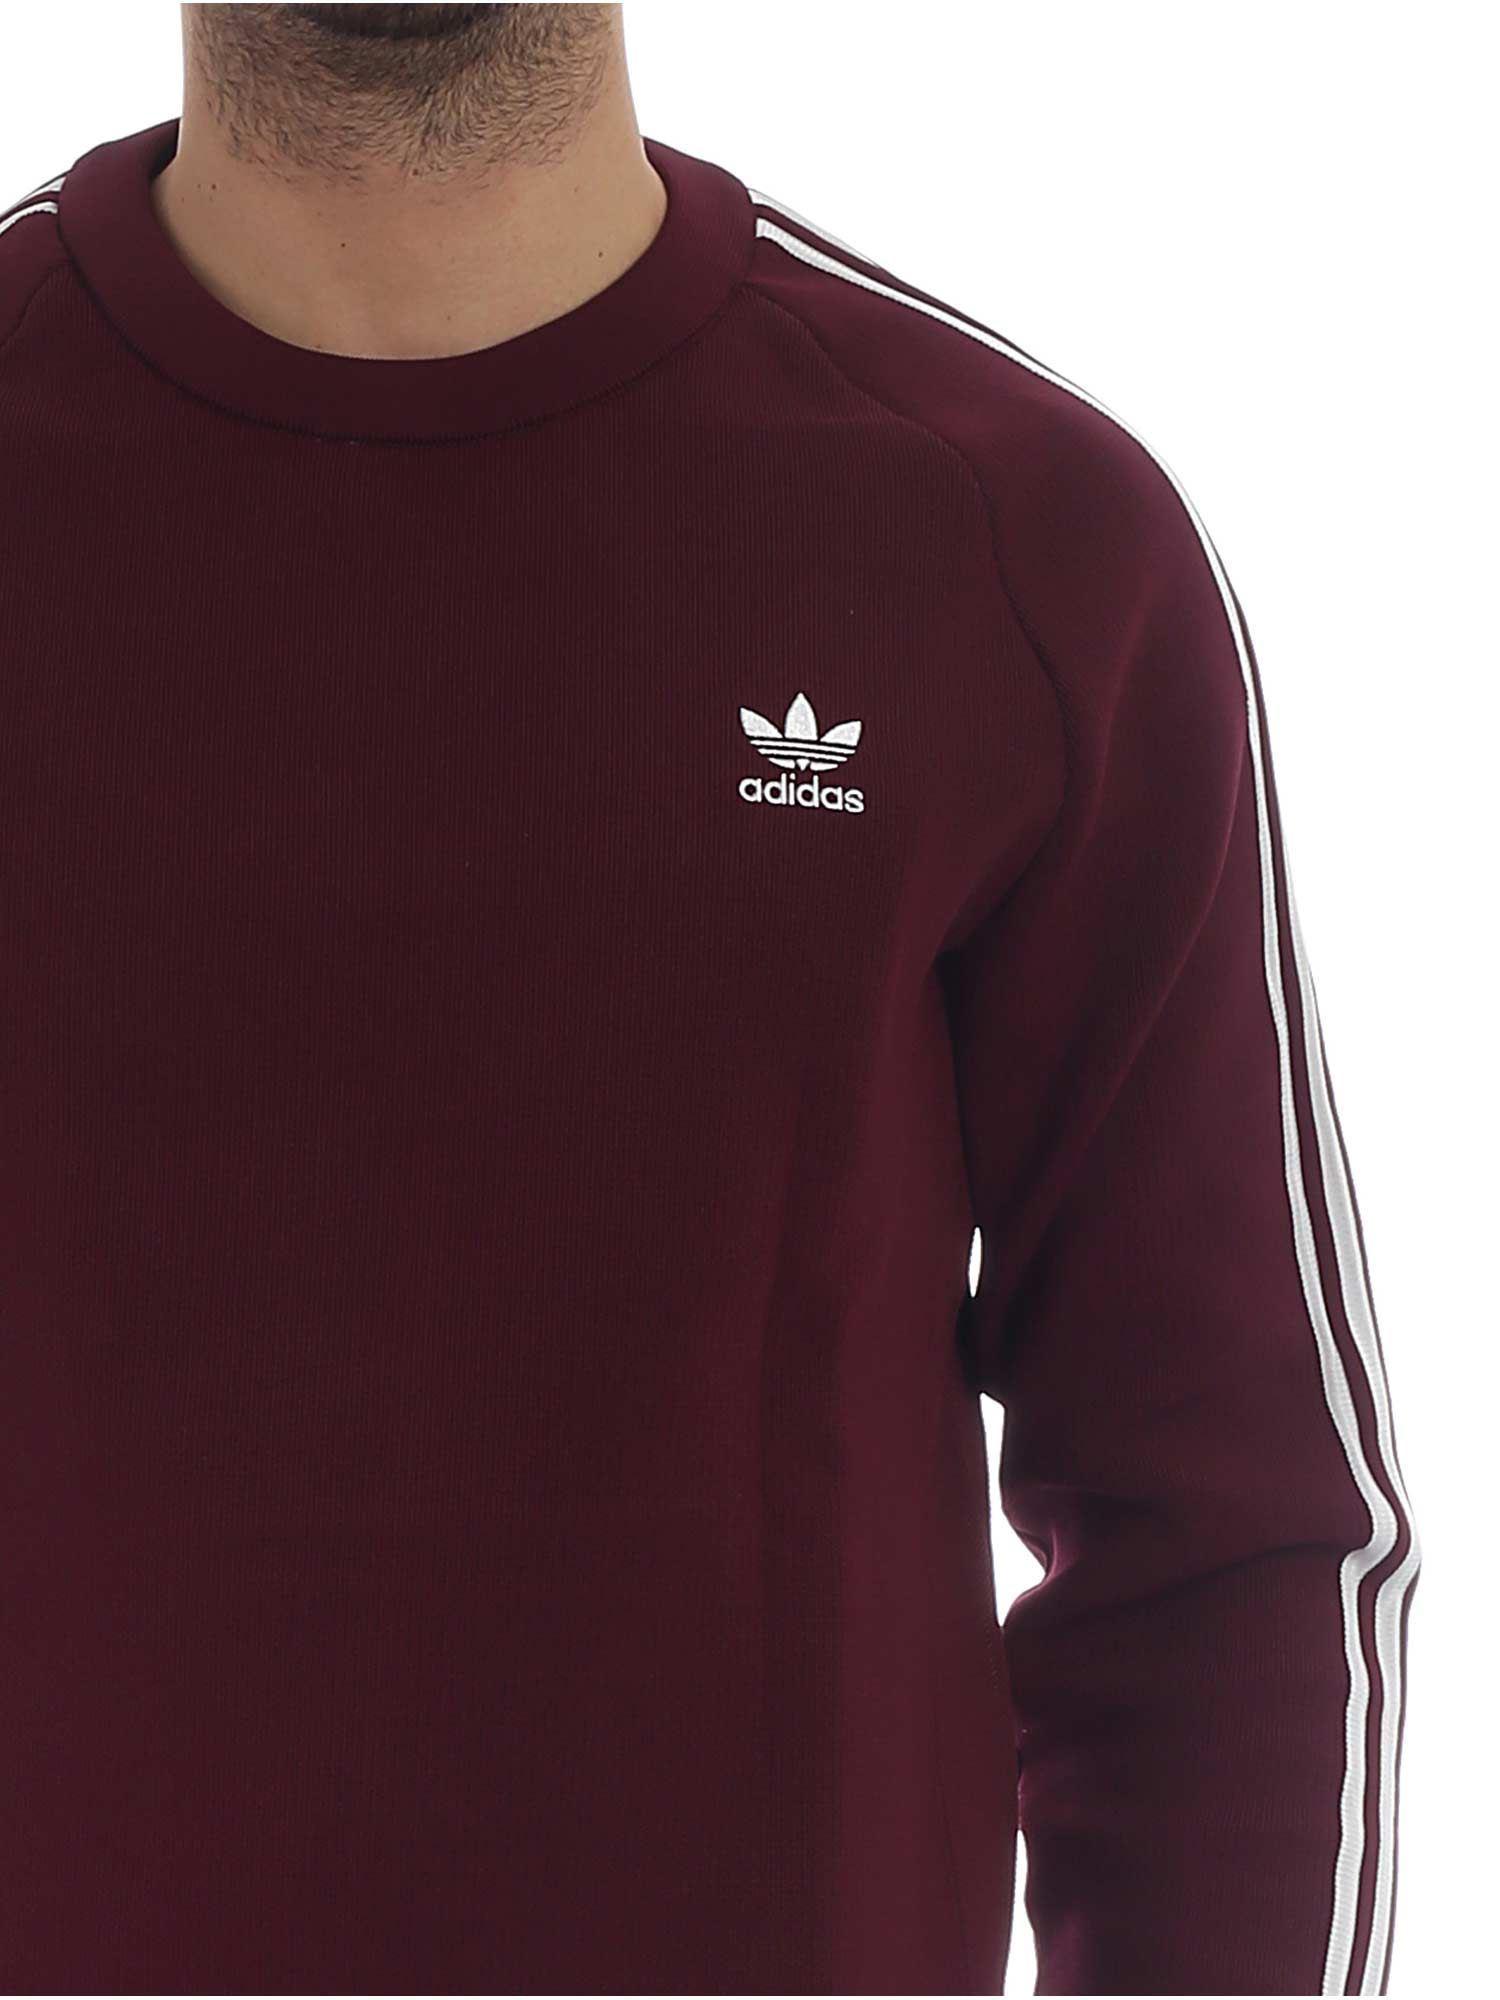 Crew Burgundy In Originals 3 White Sweatshirt With Knit Adidas xwPEaOqXO